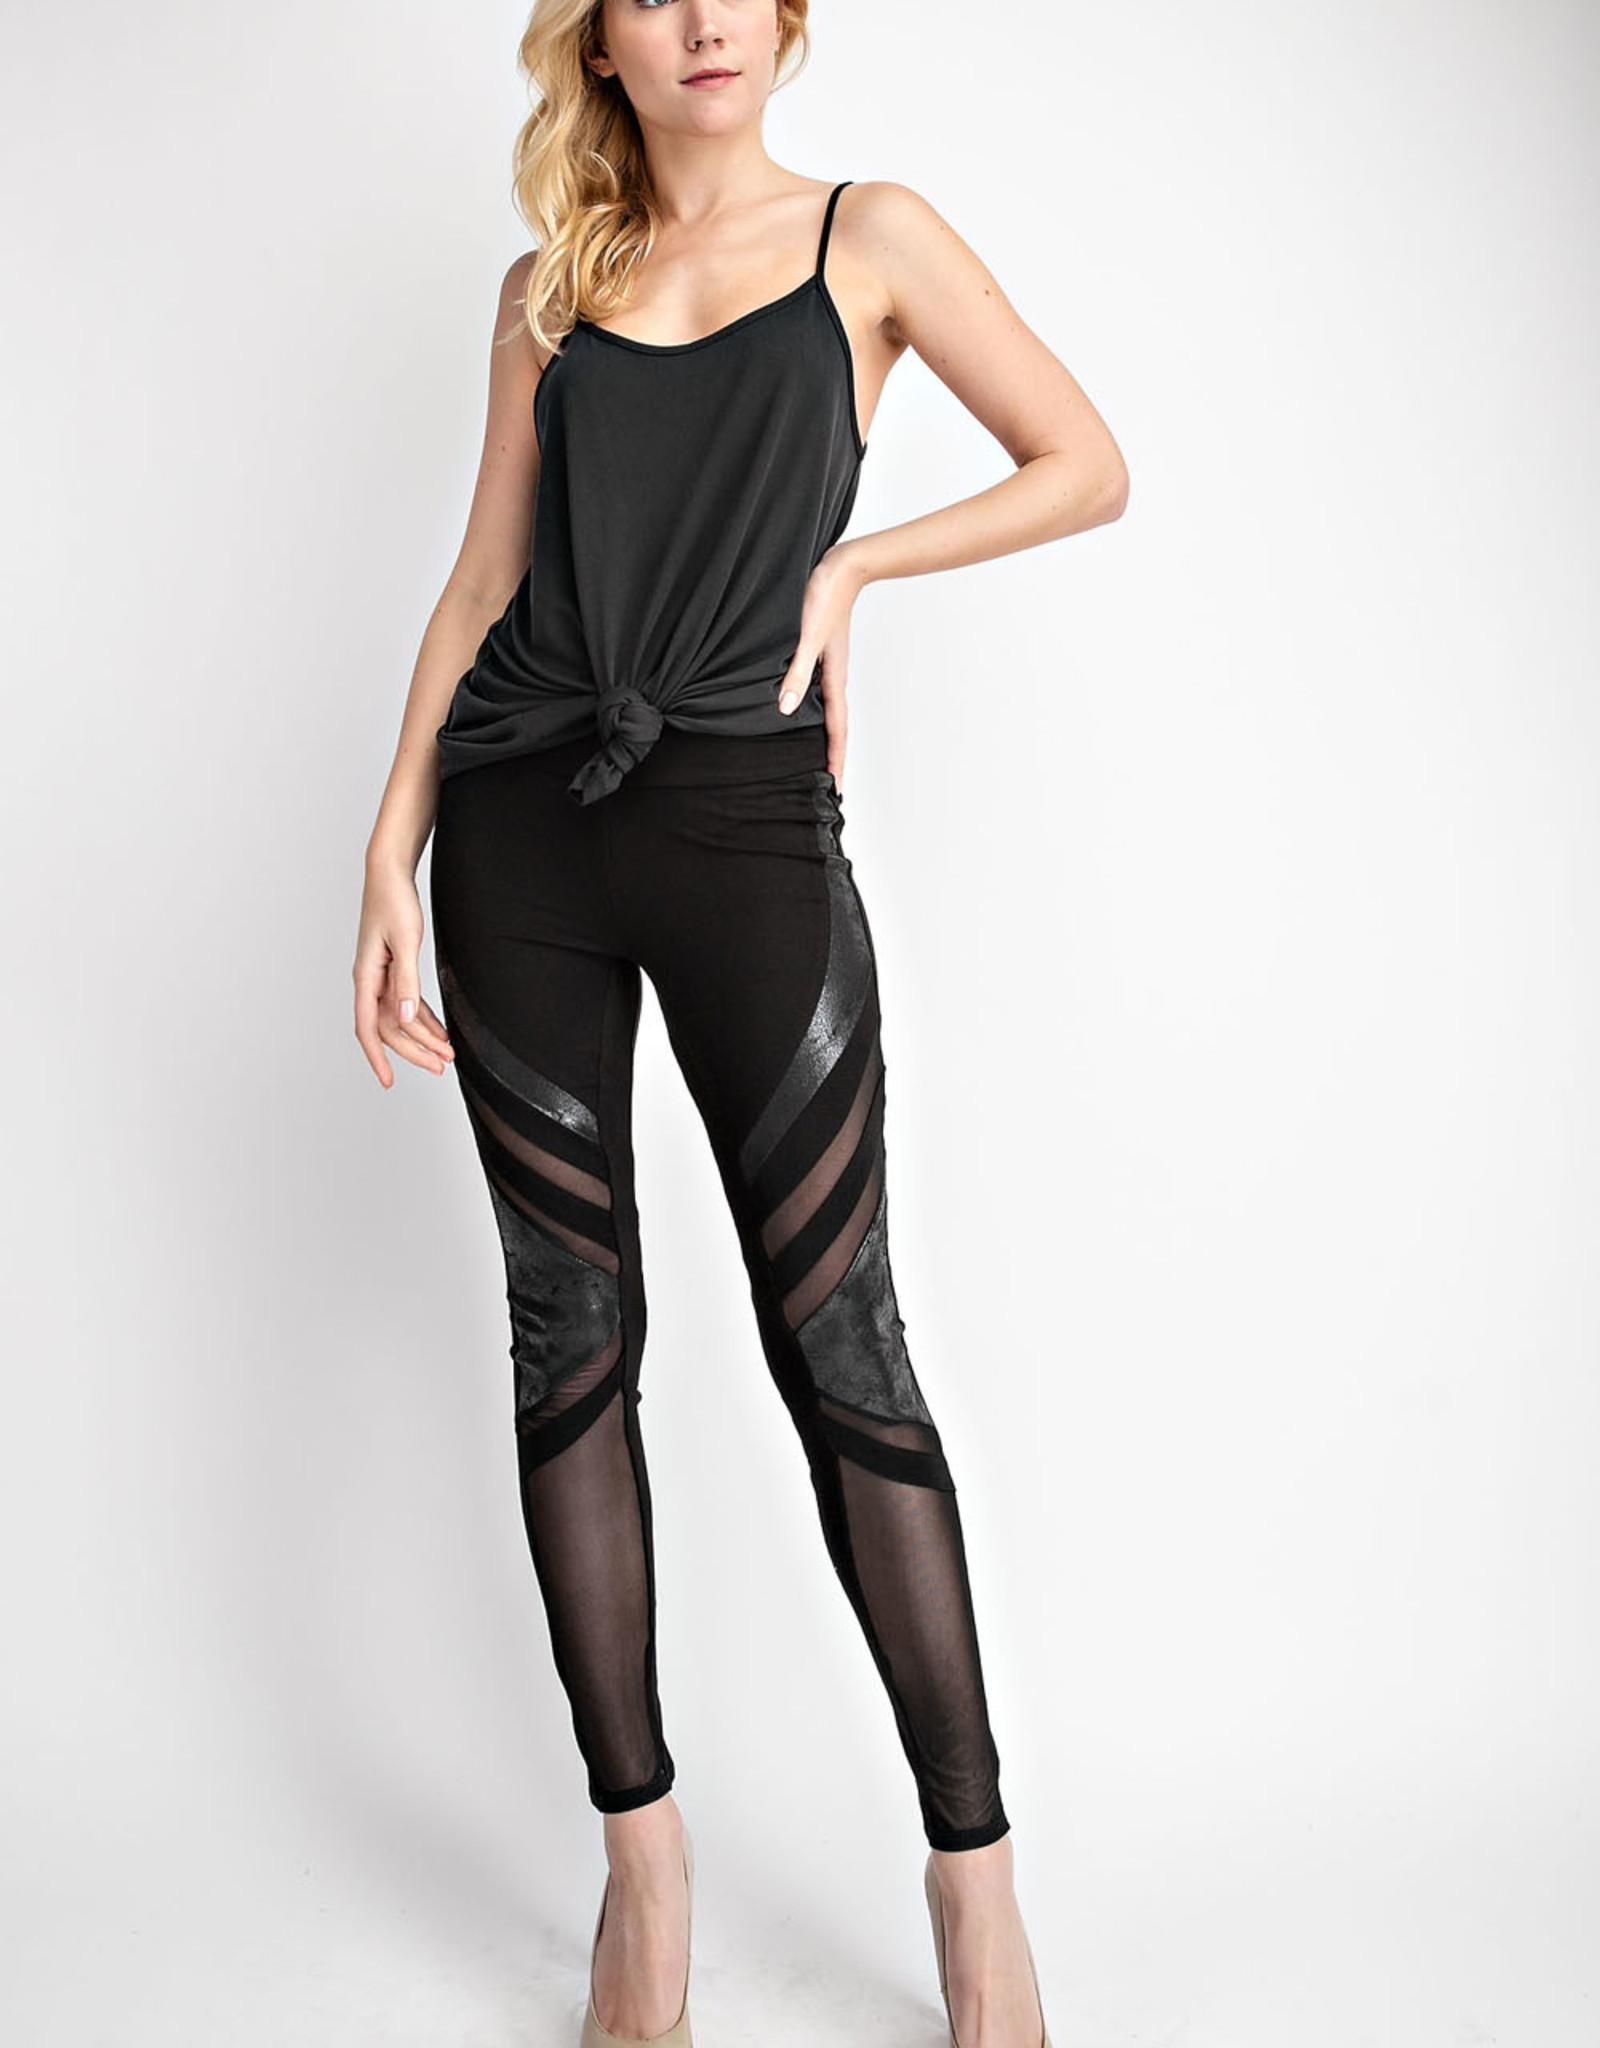 Vocal Multimedia Faux Leather Sheer Leggings